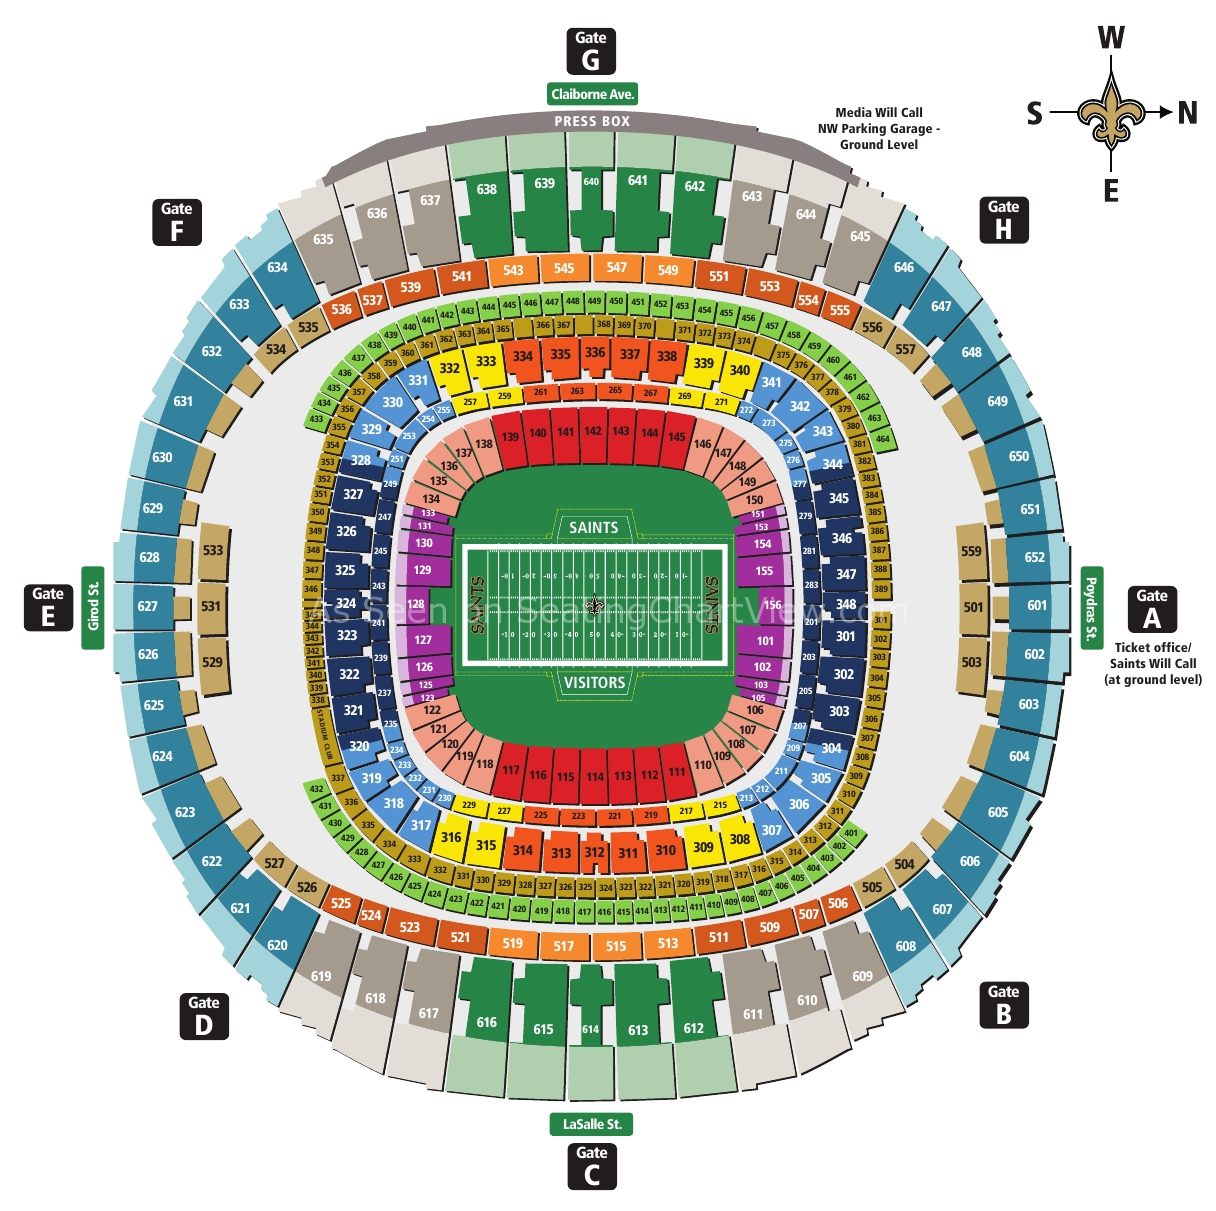 Mercedes-Benz Superdome, New Orleans La | Seating Chart View within Mercedes Benz Stadium Seating Chart For Super Bowl